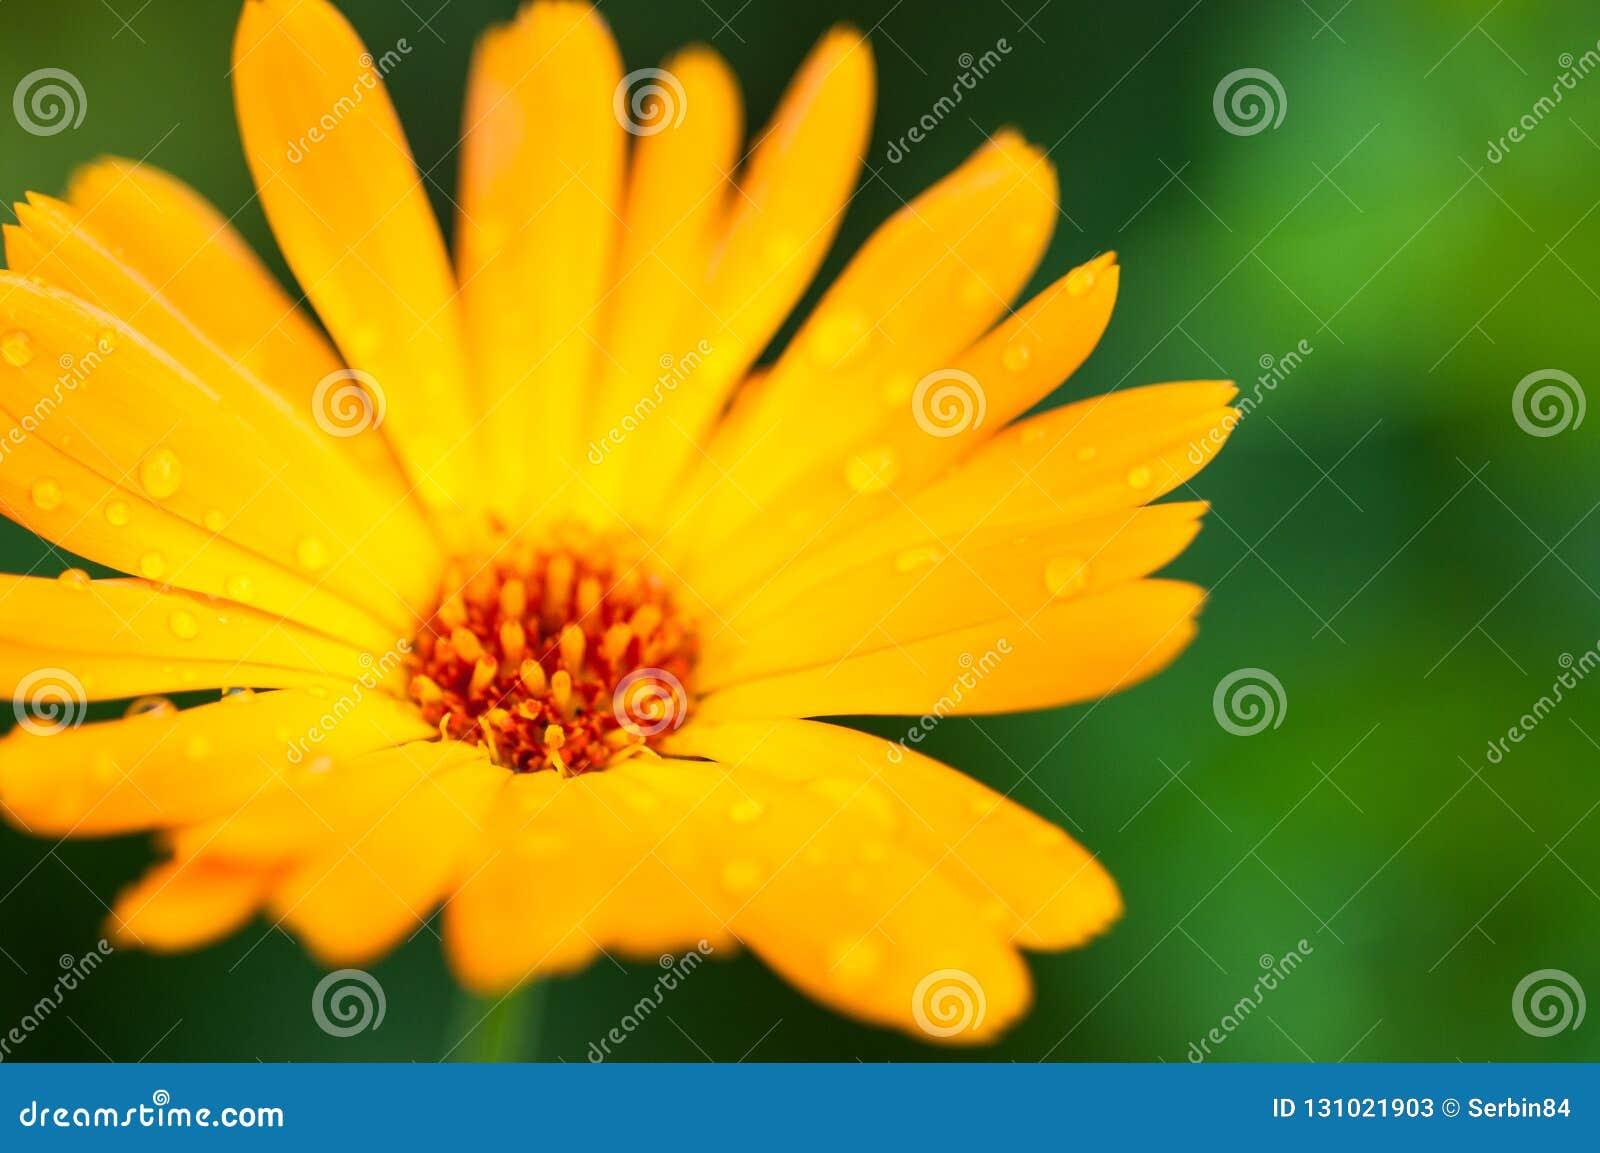 Yellow calendula flower with drops after rain. Macro photography.